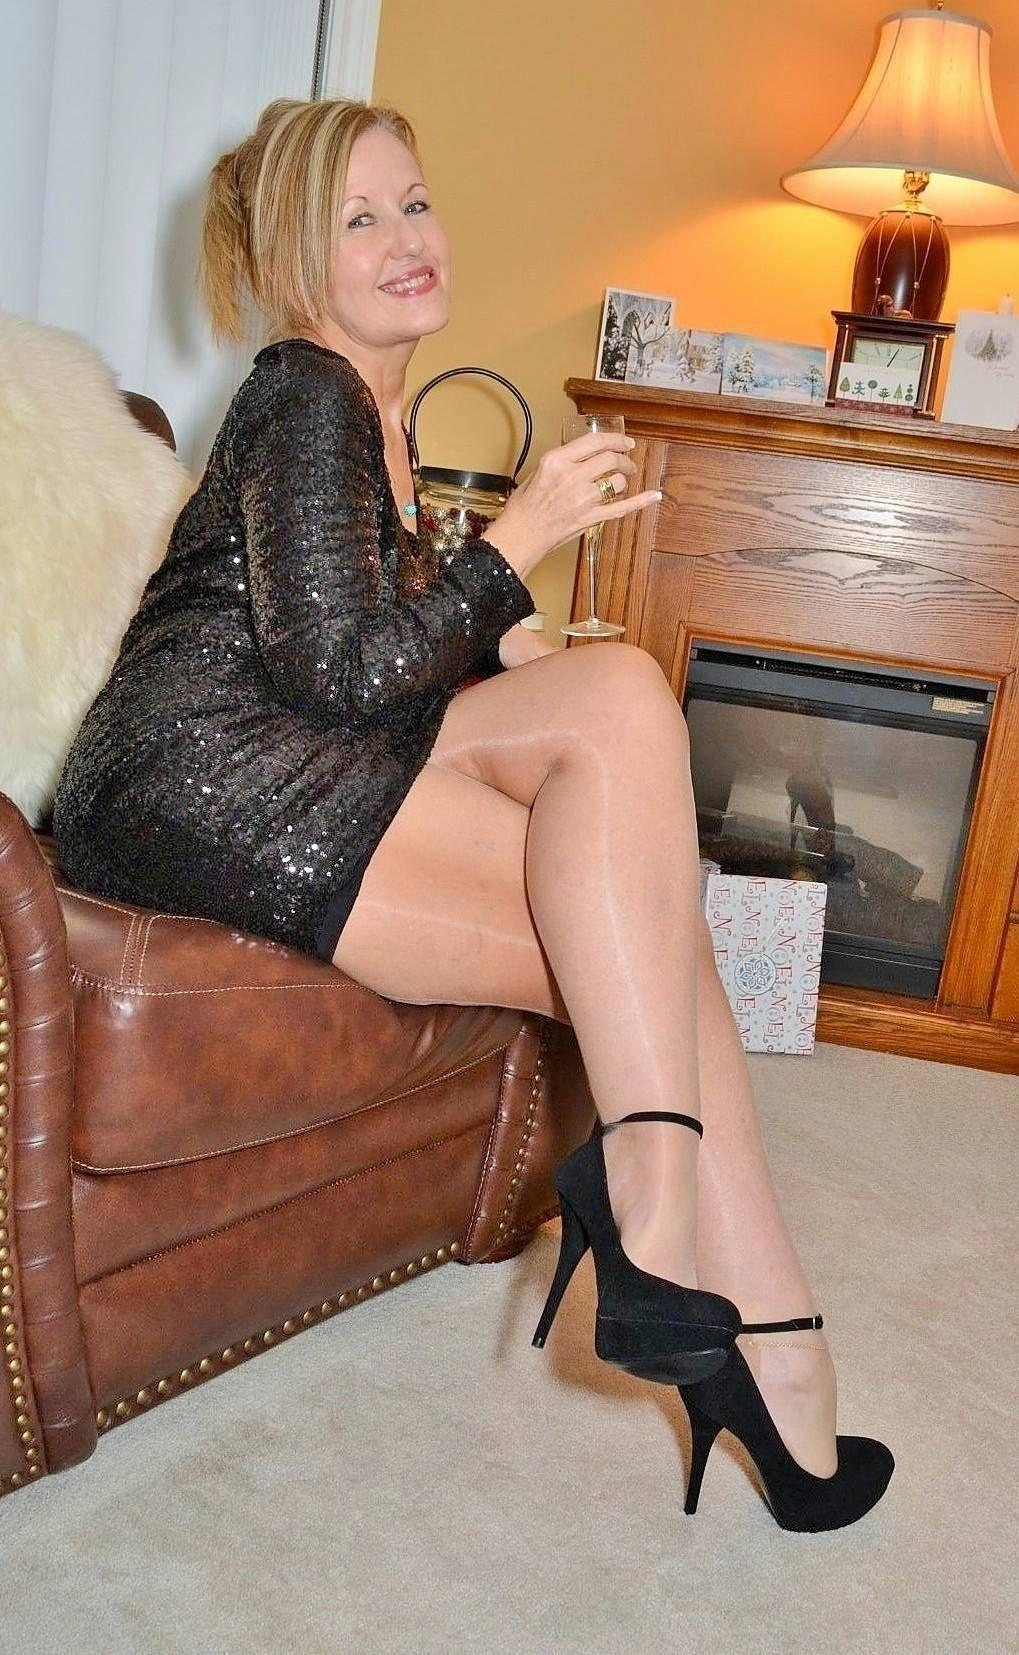 Beautiful lady sitting on sofa putting on stockings, healthy legs, varicose stock photo